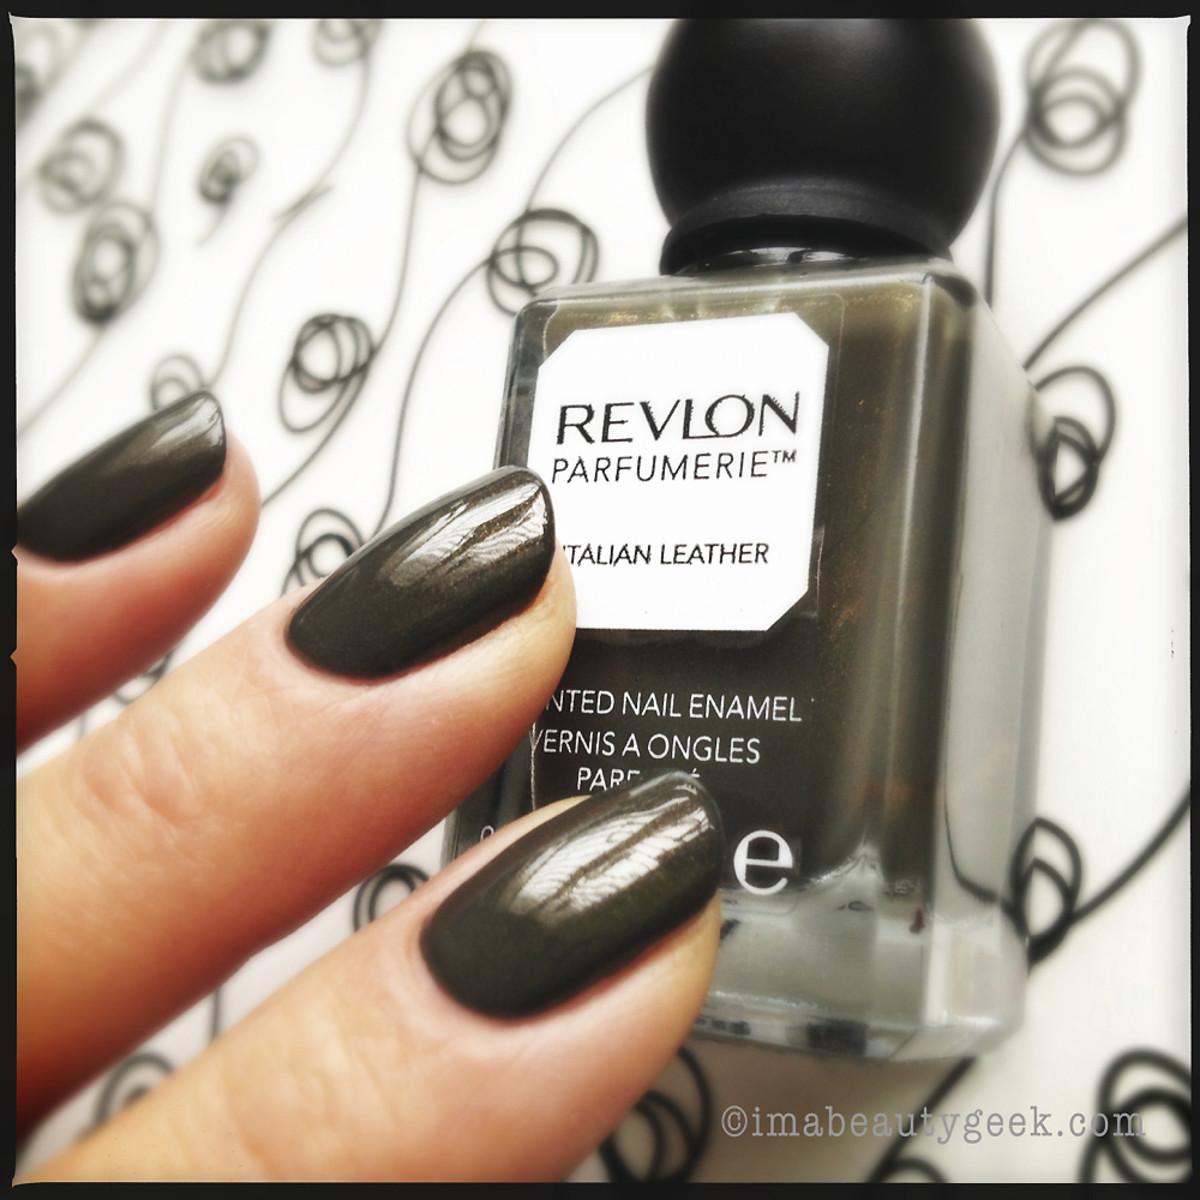 Revlon Parfumerie Italian Leather